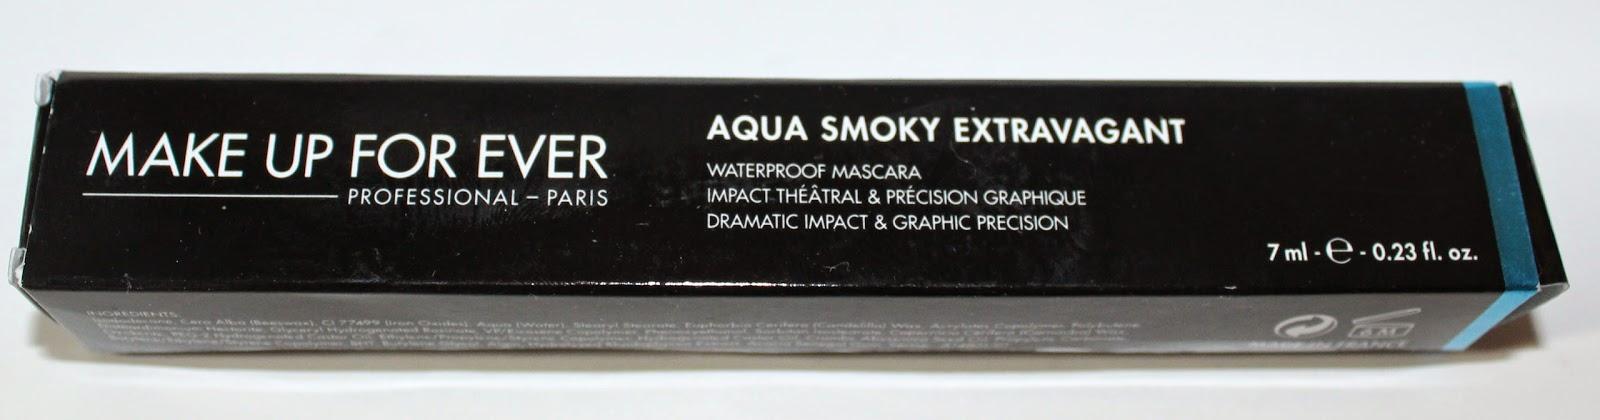 MAKE UP FOR EVER Aqua Smoky Extravagant Waterproof Mascara Box